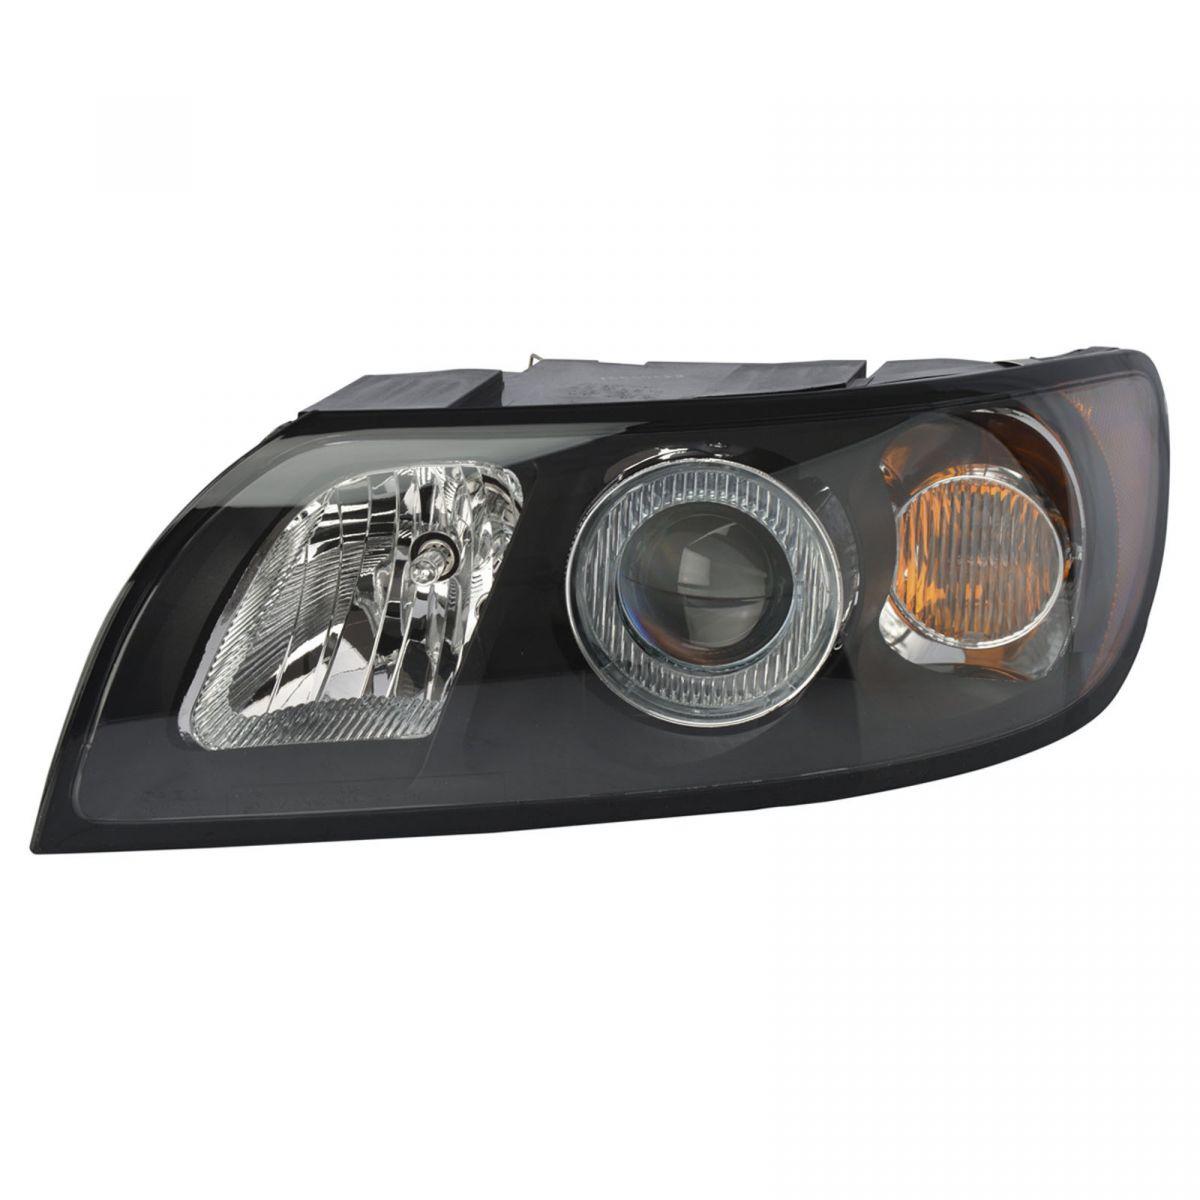 Headlight Headlamp Driver Side Left Lh For 04 07 Volvo S40 V40 V50 2004 V4 0 Wagon